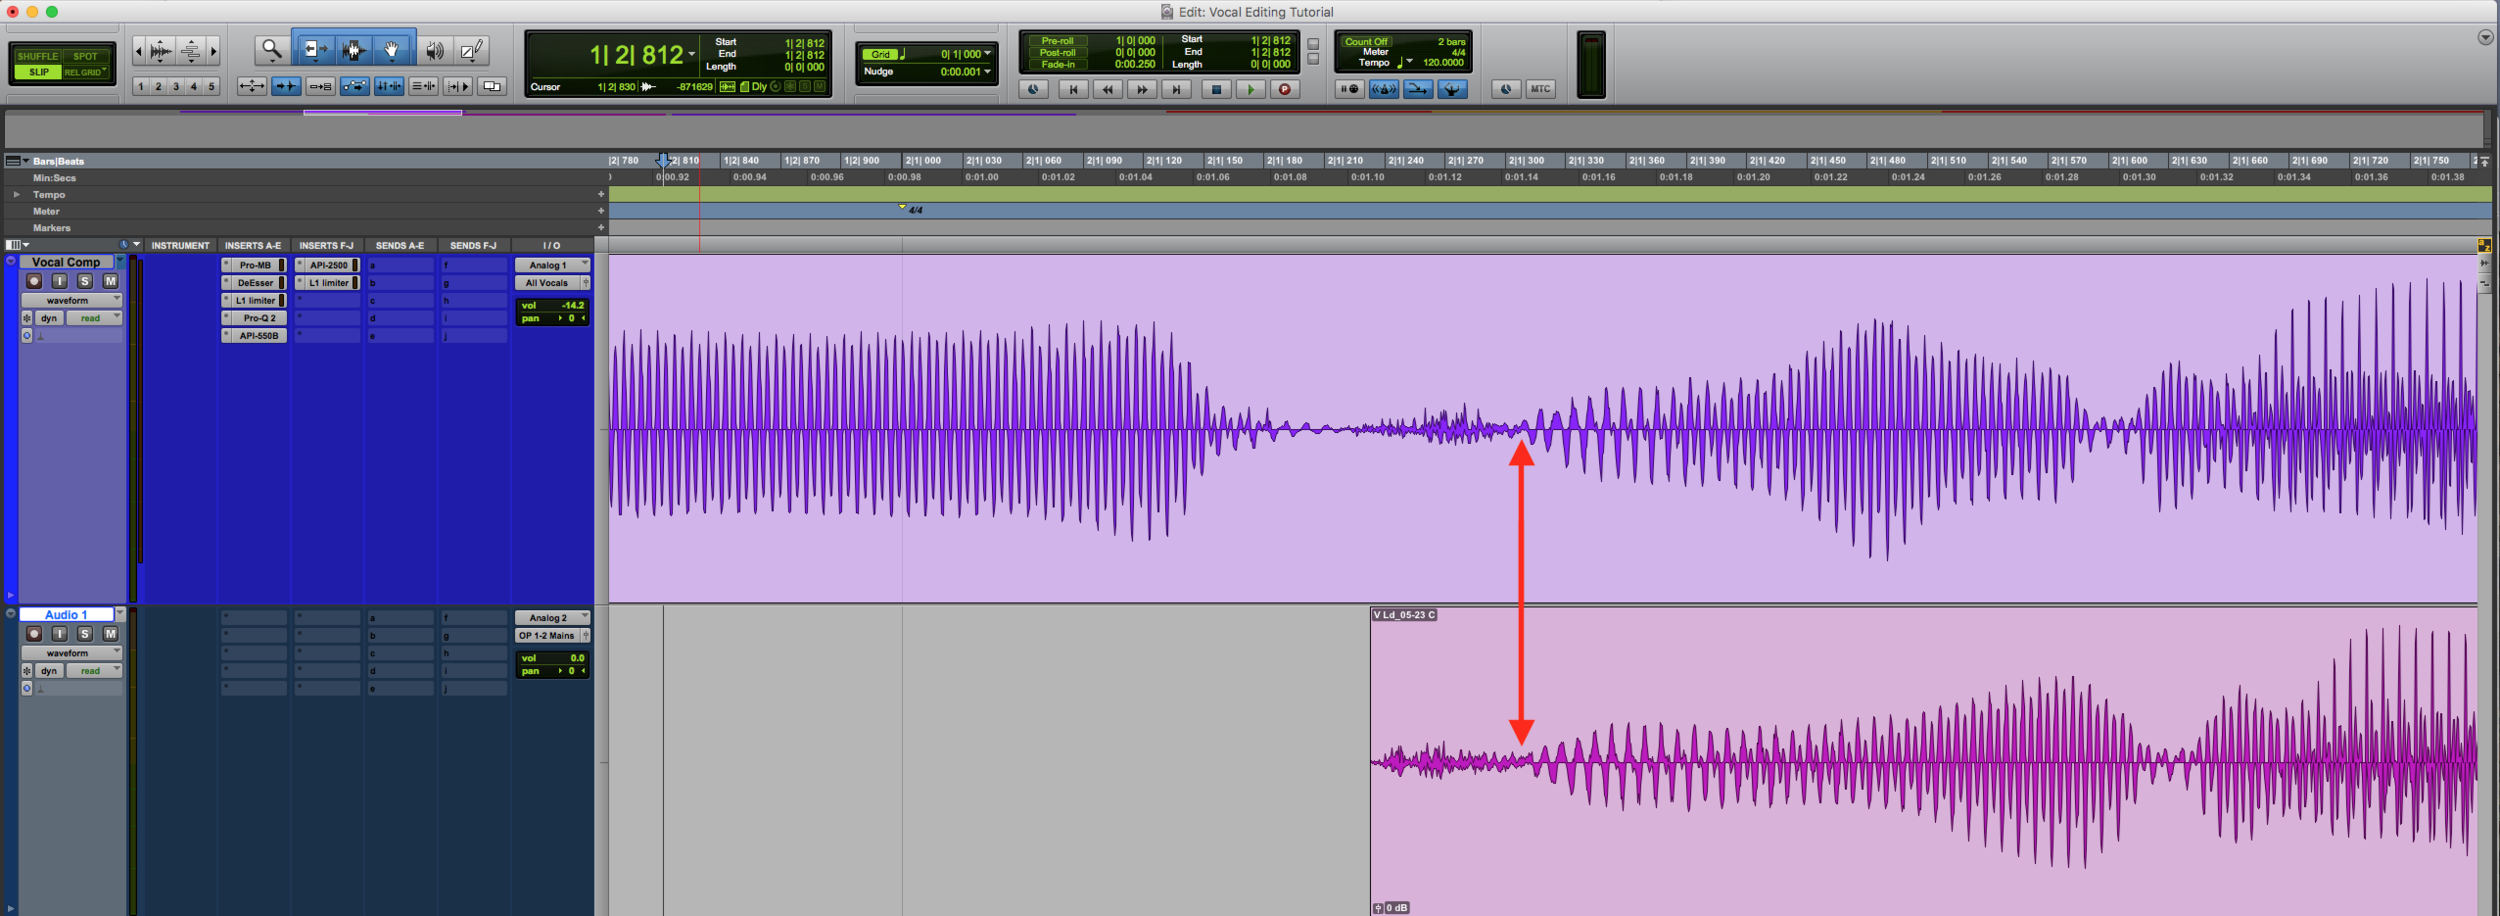 Vocal Editing Nudge Clip